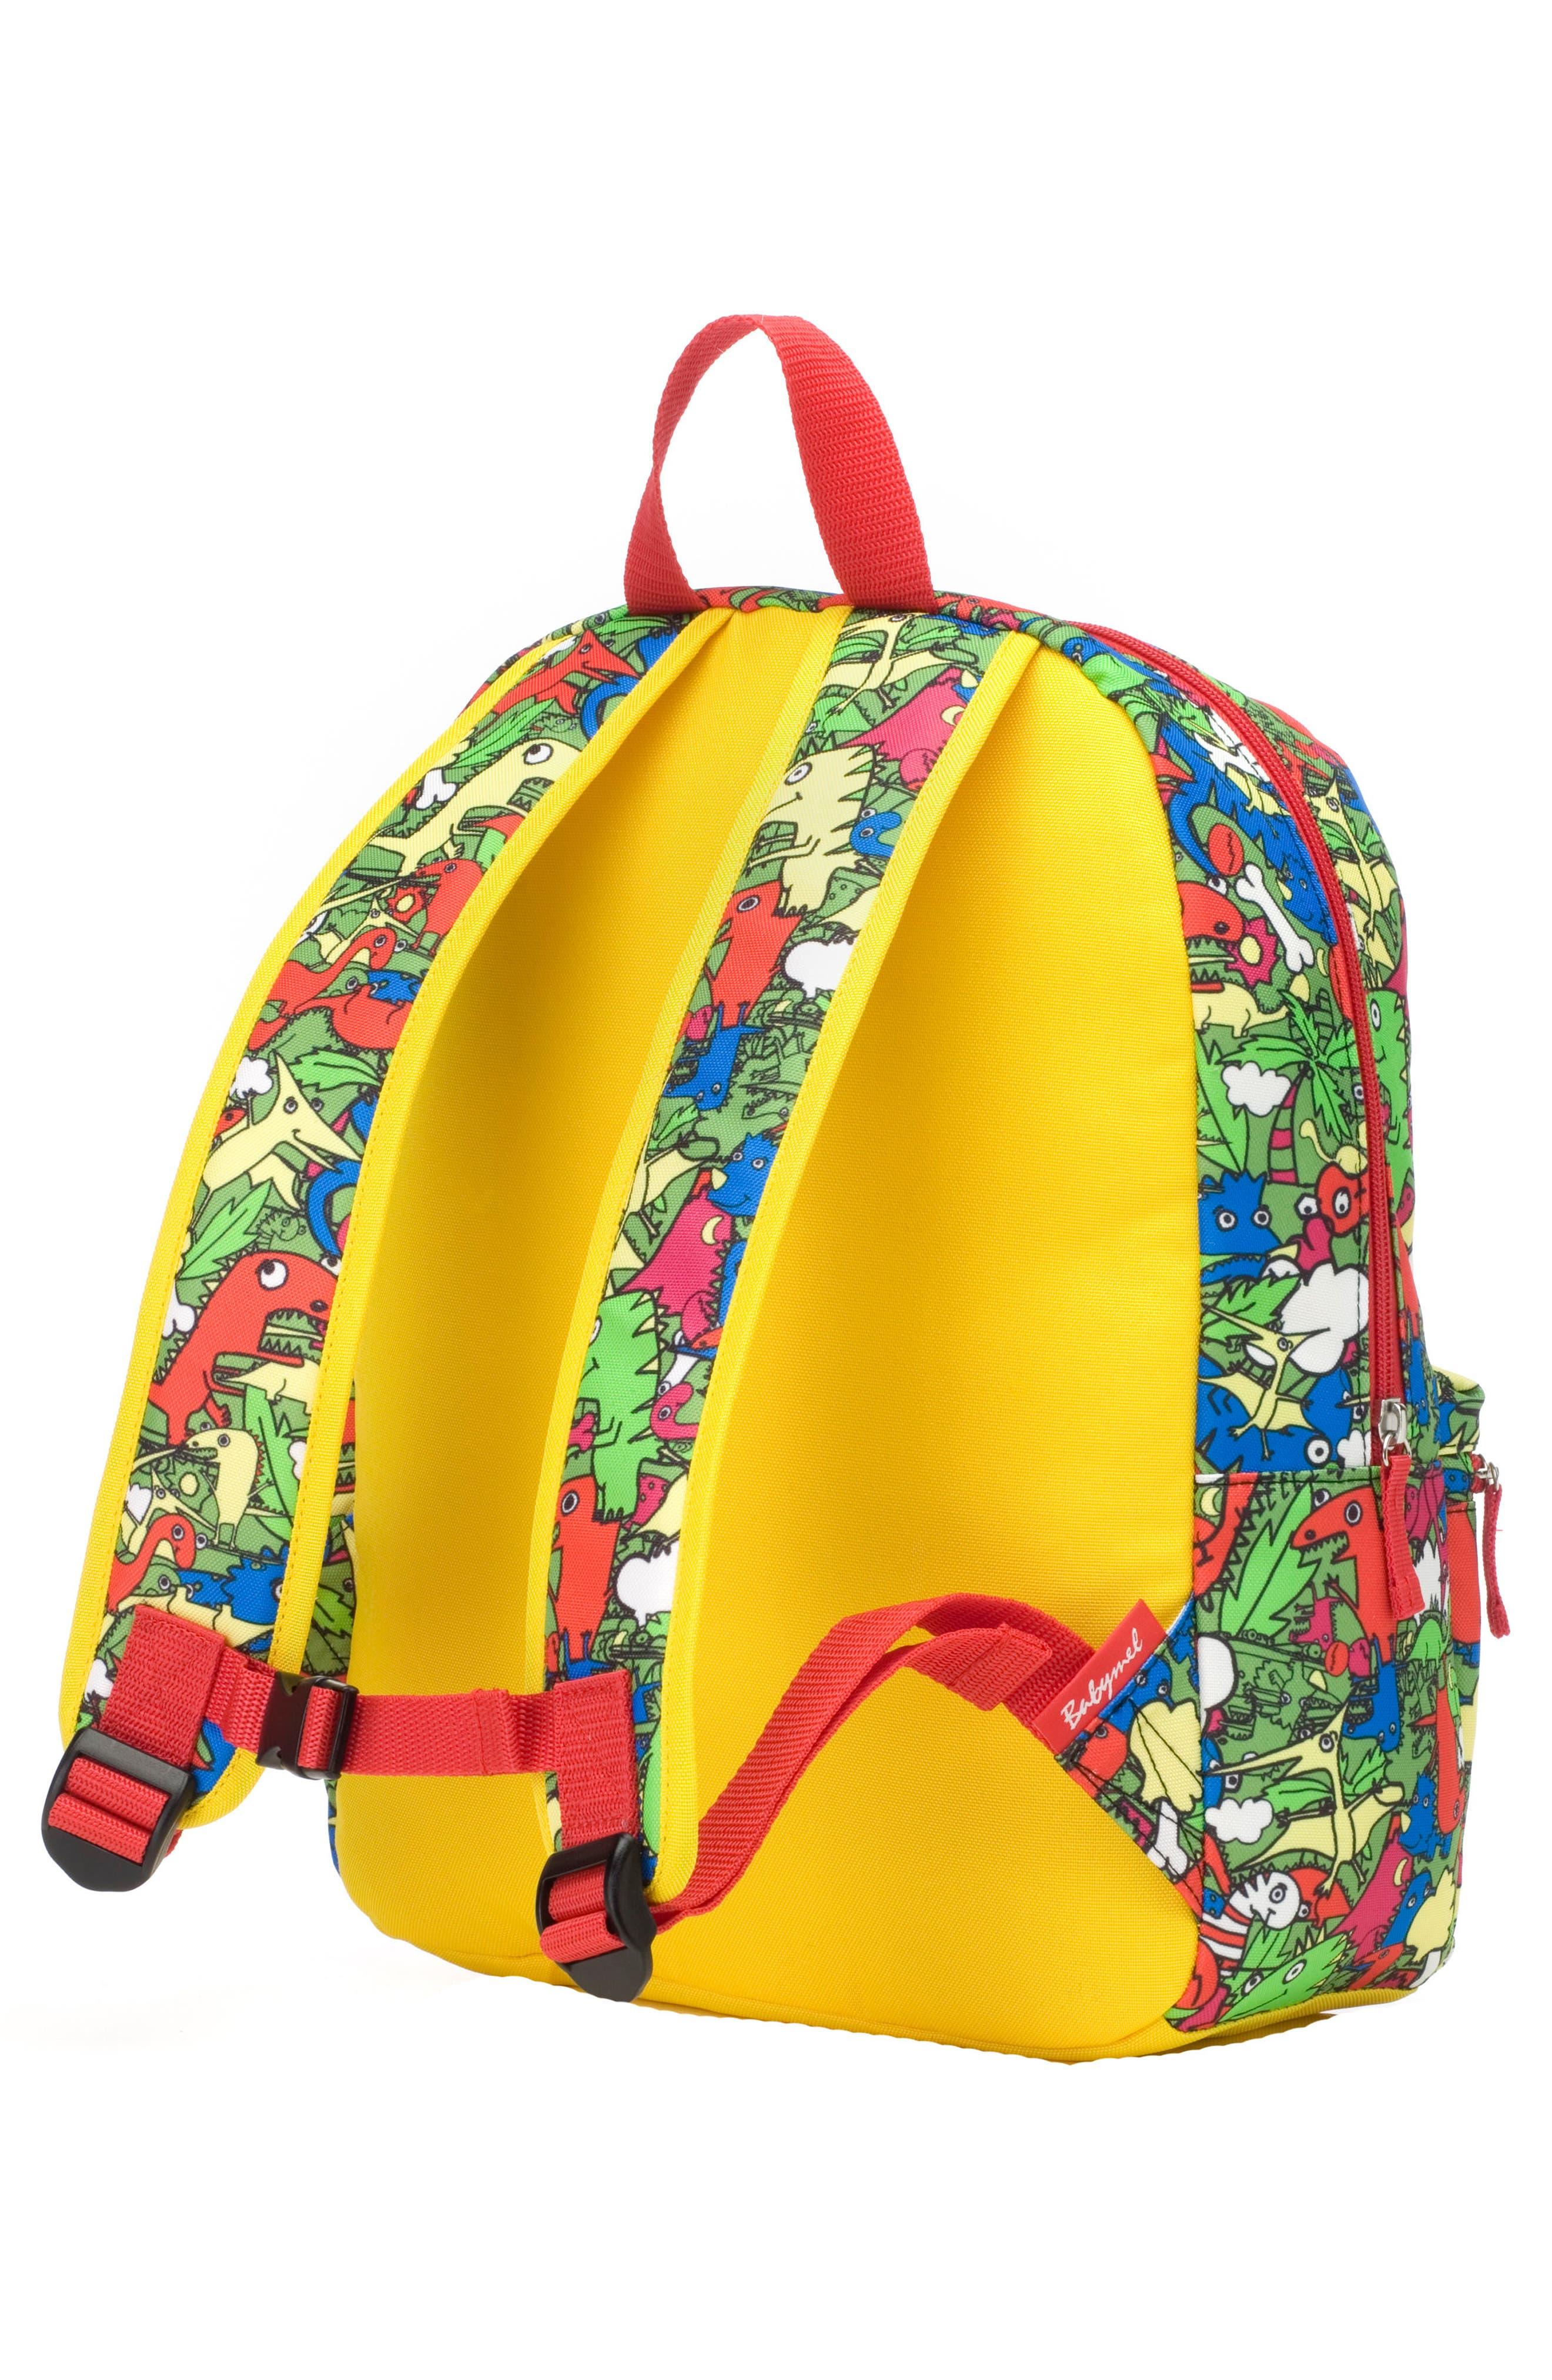 Zip & Zoe Dino Junior Backpack,                             Alternate thumbnail 2, color,                             DINO